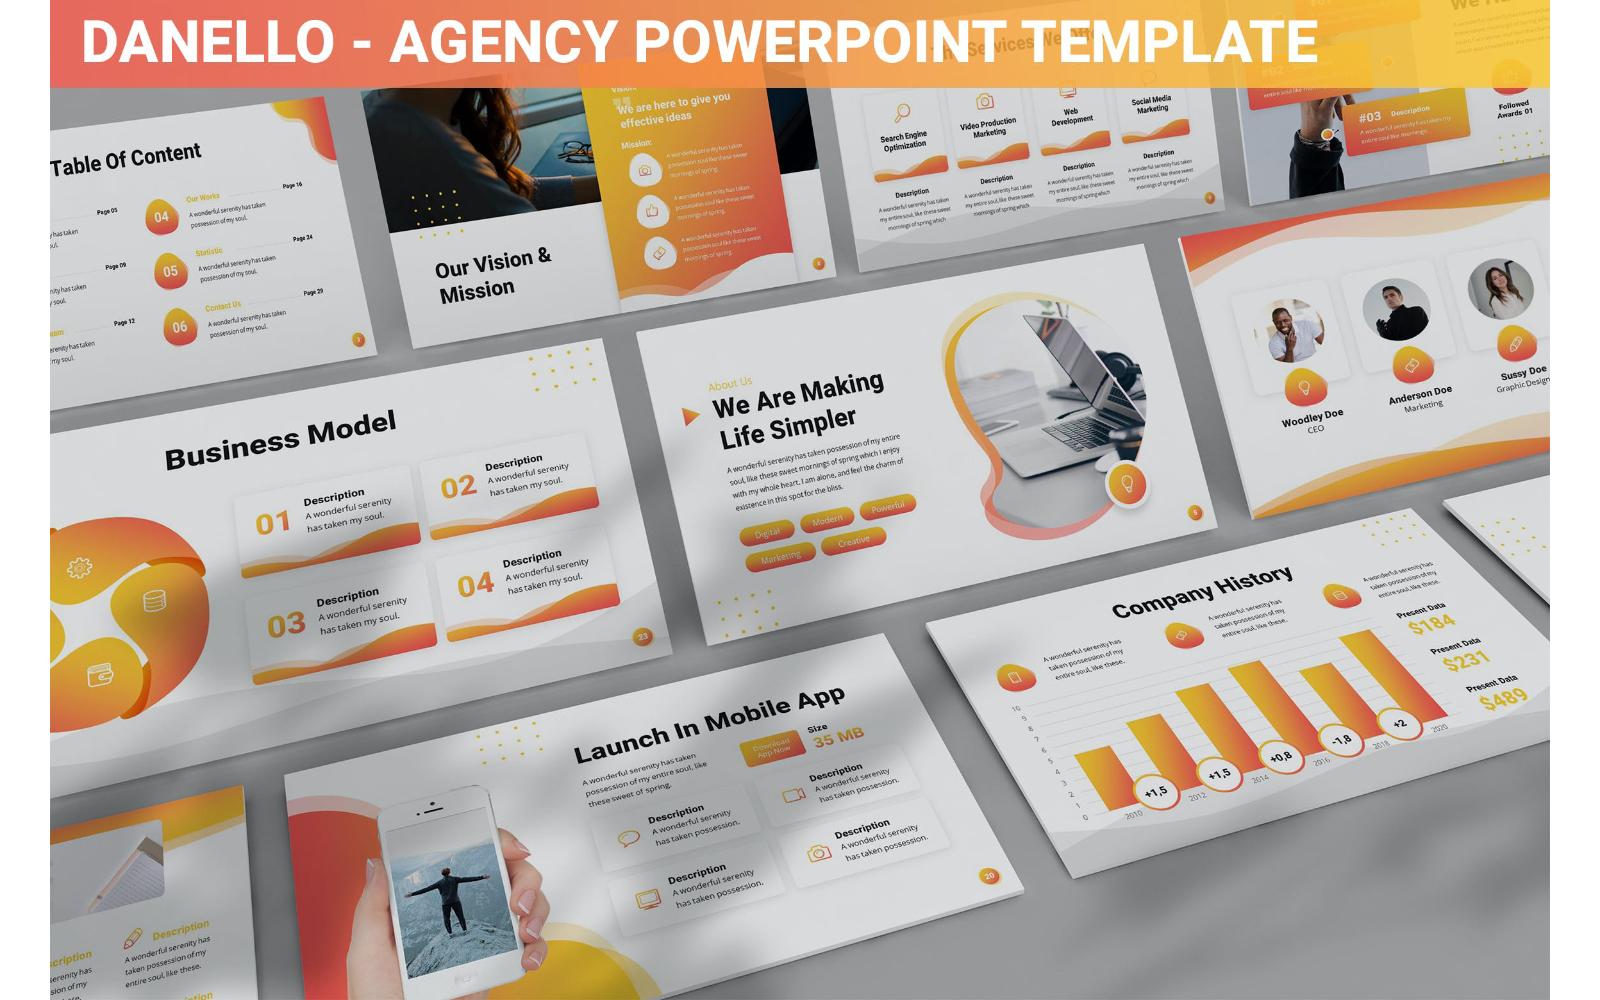 Danello - Agency Powerpoint Template